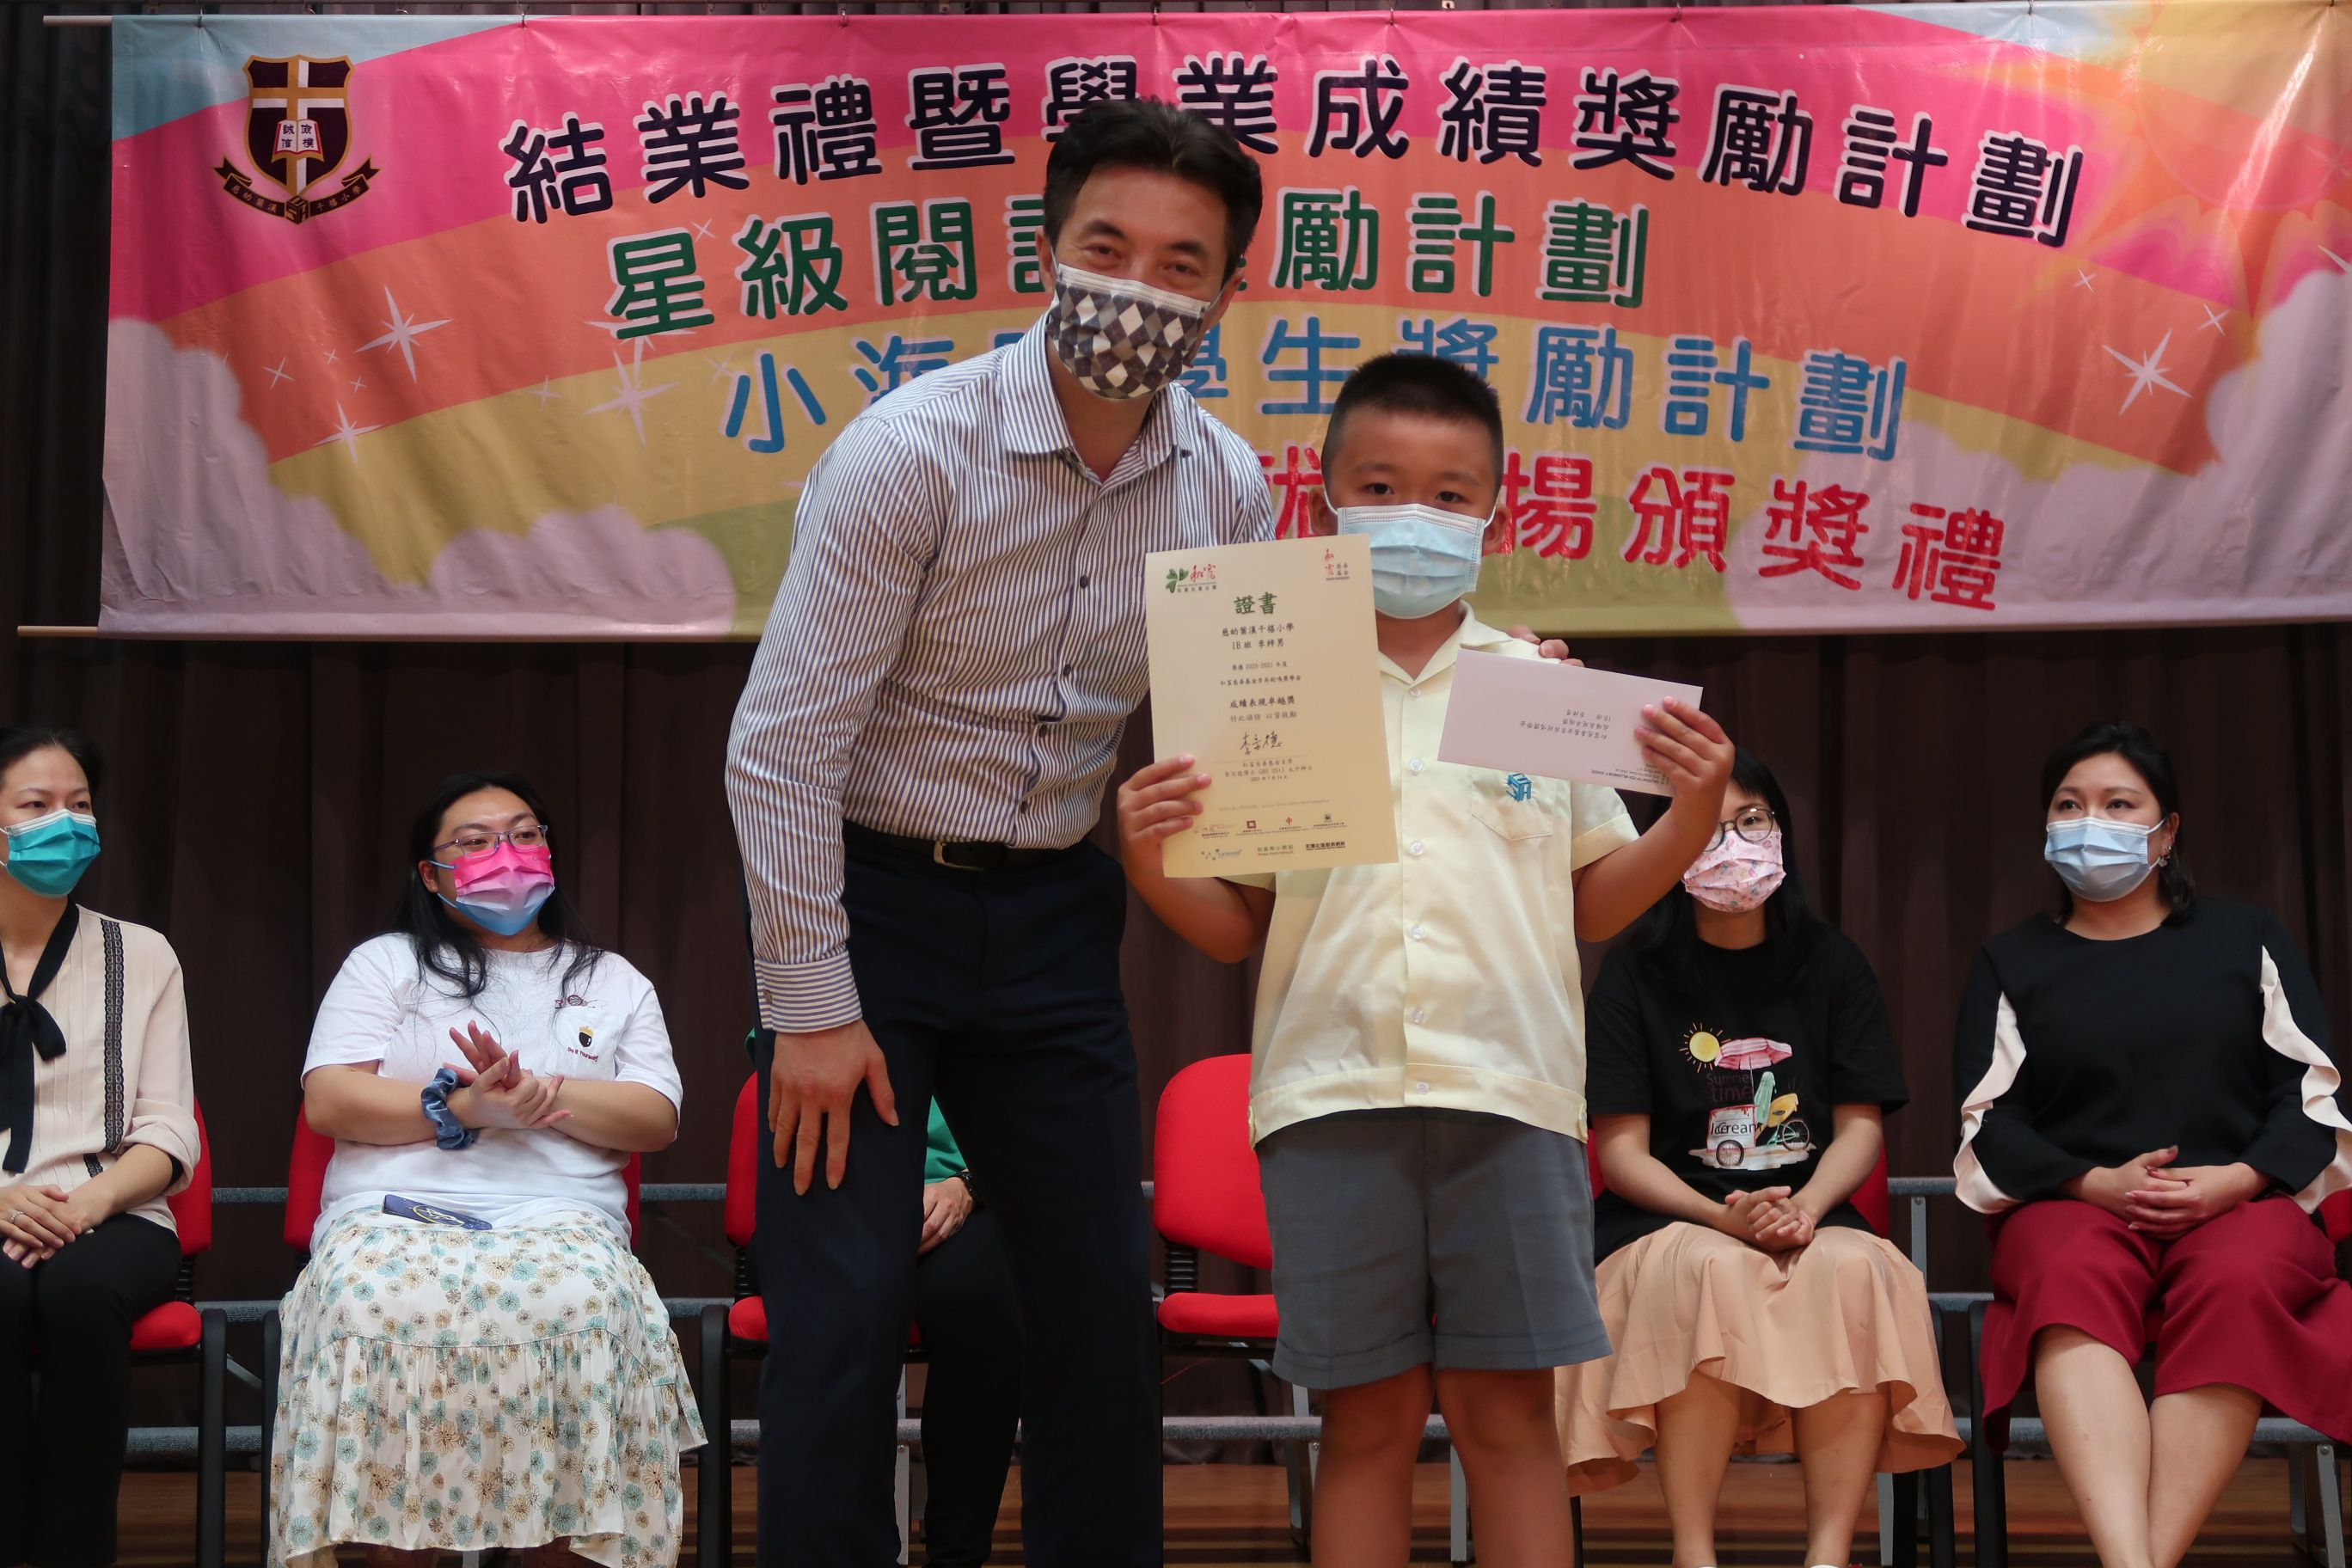 https://syh.edu.hk/sites/default/files/img_5928.jpg